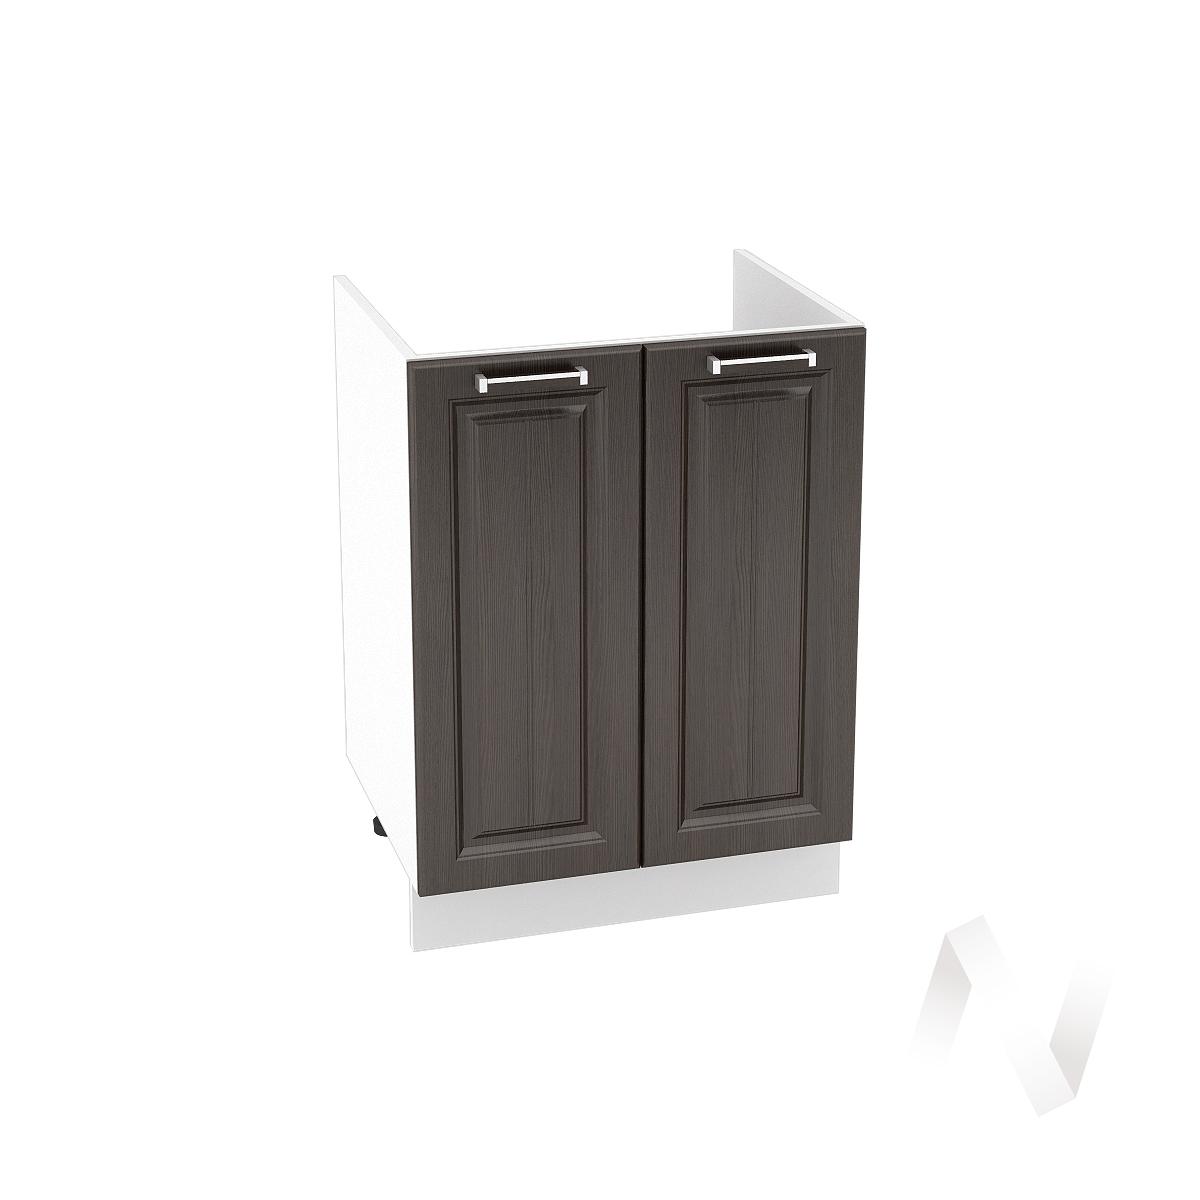 "Кухня ""Прага"": Шкаф нижний под мойку 600, ШНМ 600 (венге/корпус белый)"